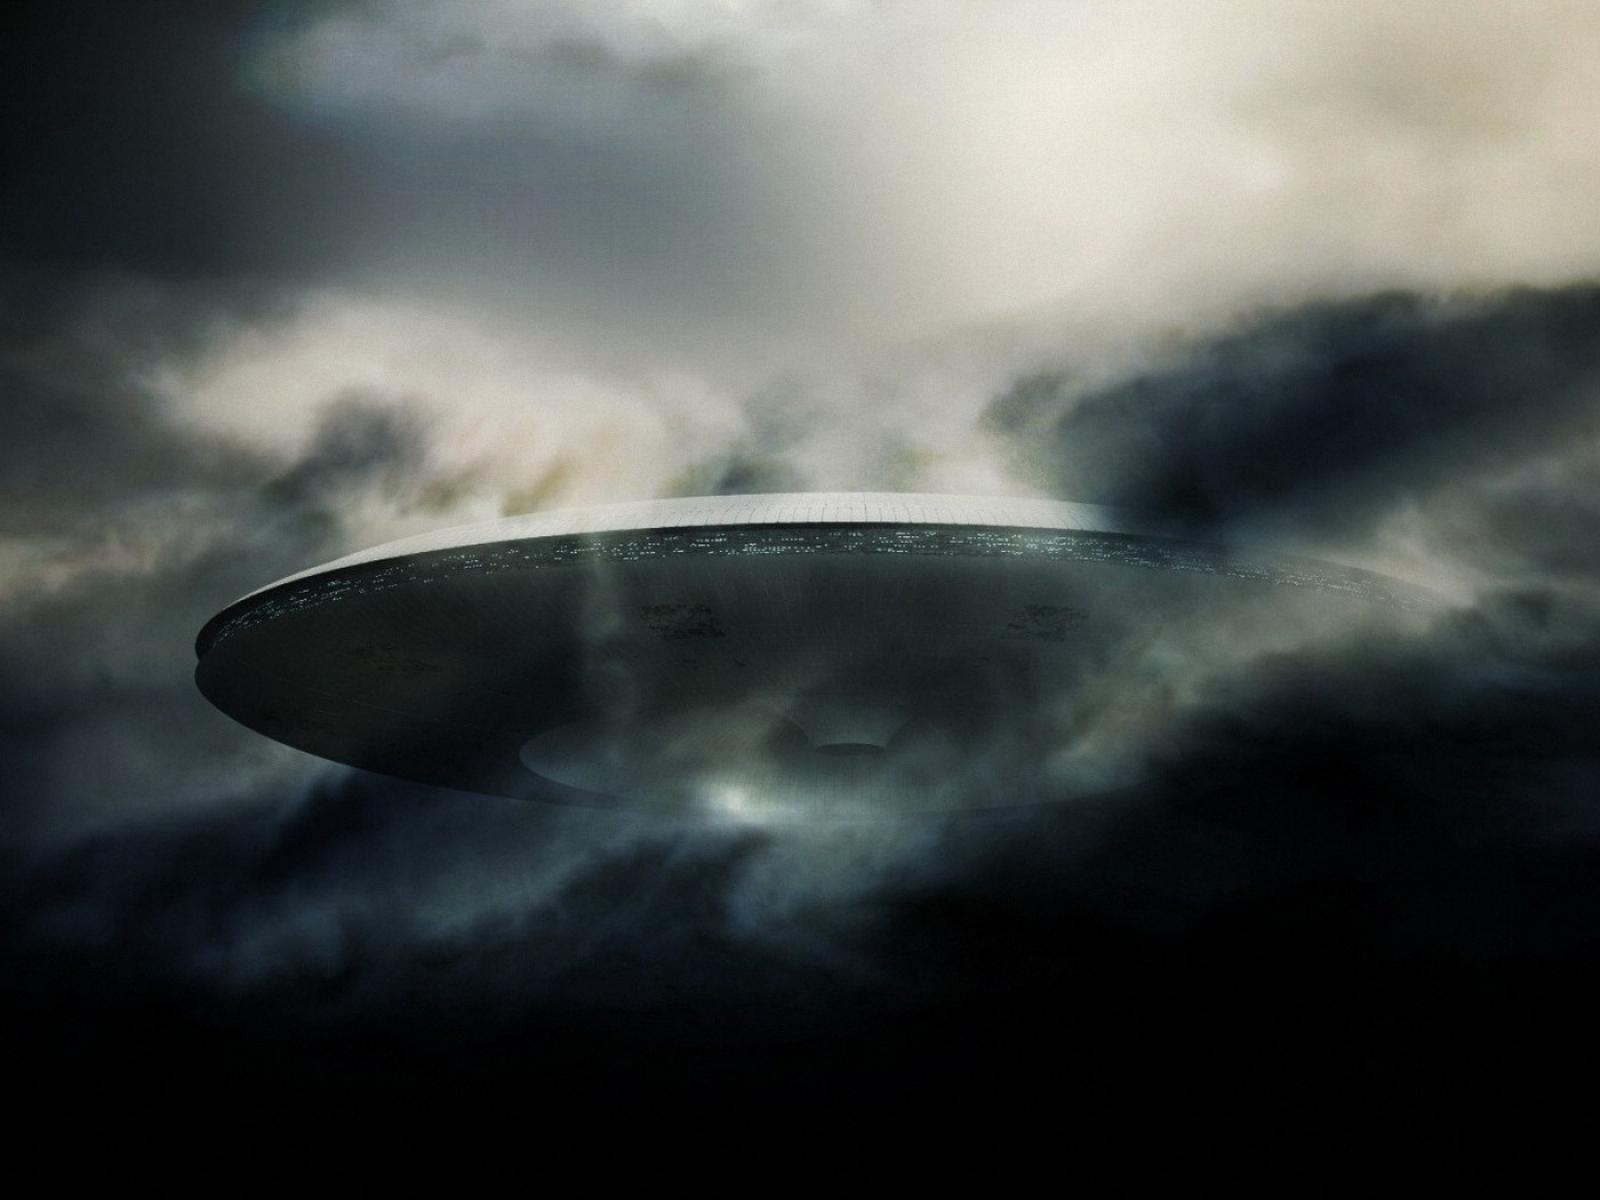 Best 51 UFO Files Wallpaper on HipWallpaper Moving UFO 1600x1200